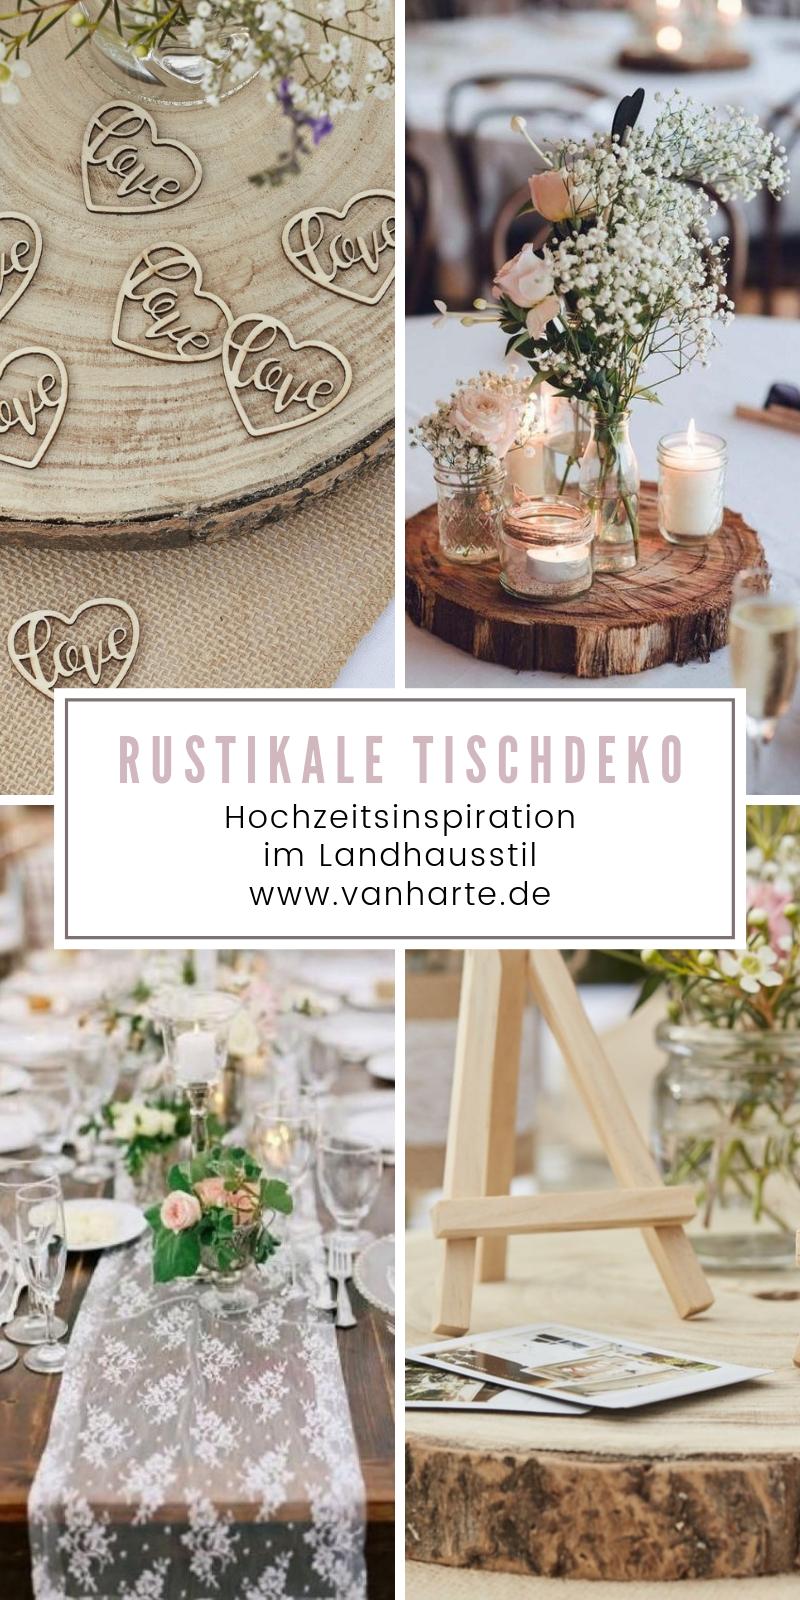 Photo of Rustikale Tischdeko im Landhausstil | Blog di van harte